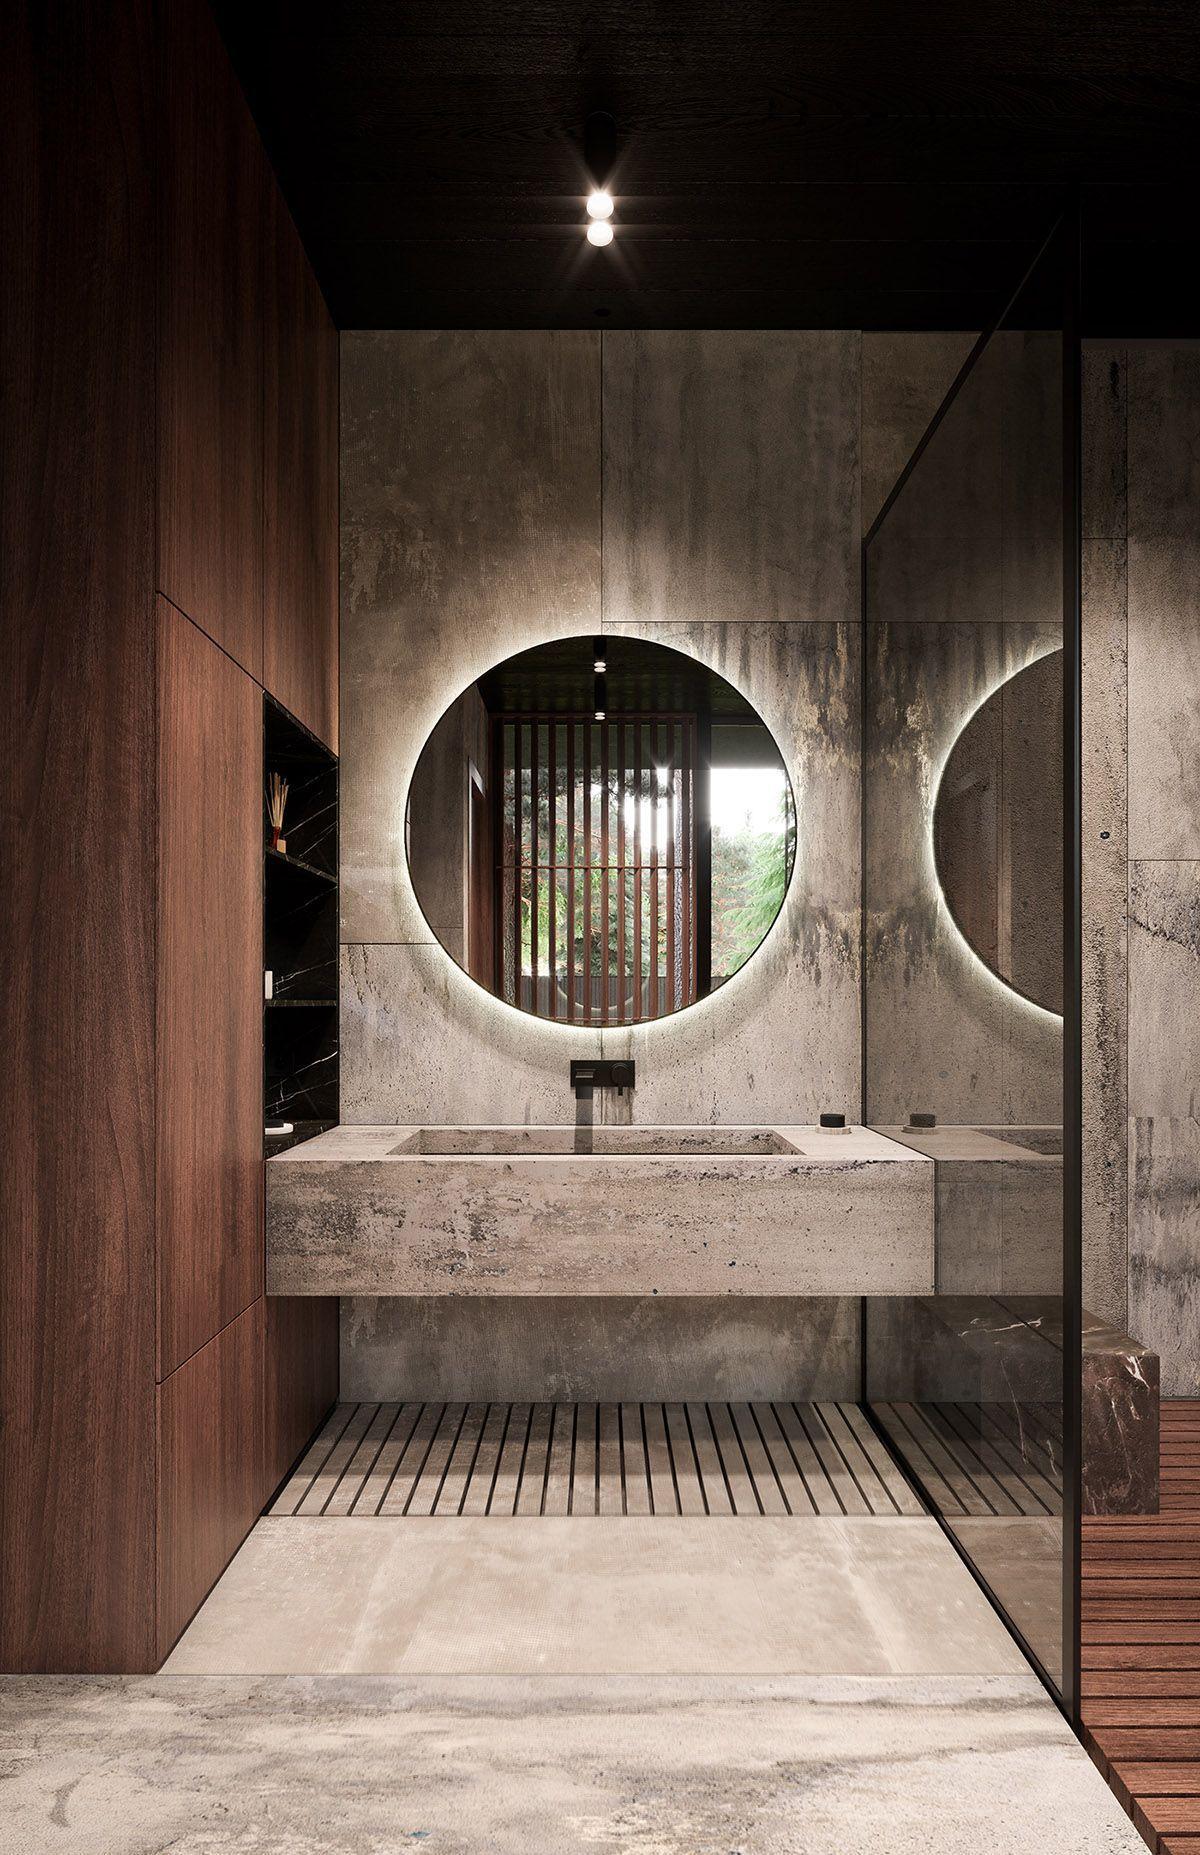 Das Beste Badezimmer Modern Pinterest Entwurf - Houz Ideen Wadudu